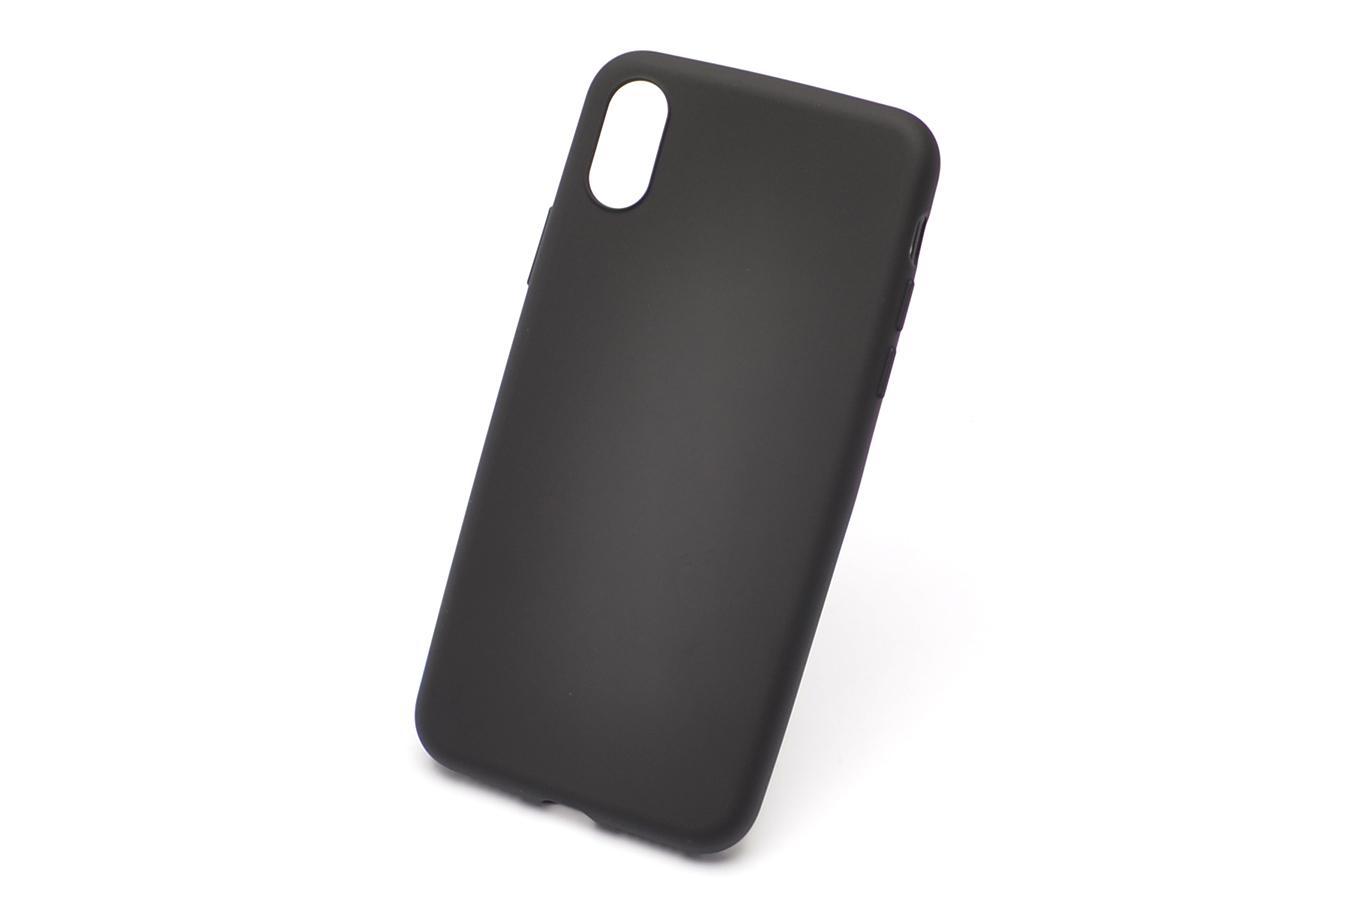 Купить Чехол-накладка Remax Ghost Rider (BL-01) для Apple iPhone X/XS пластик черный